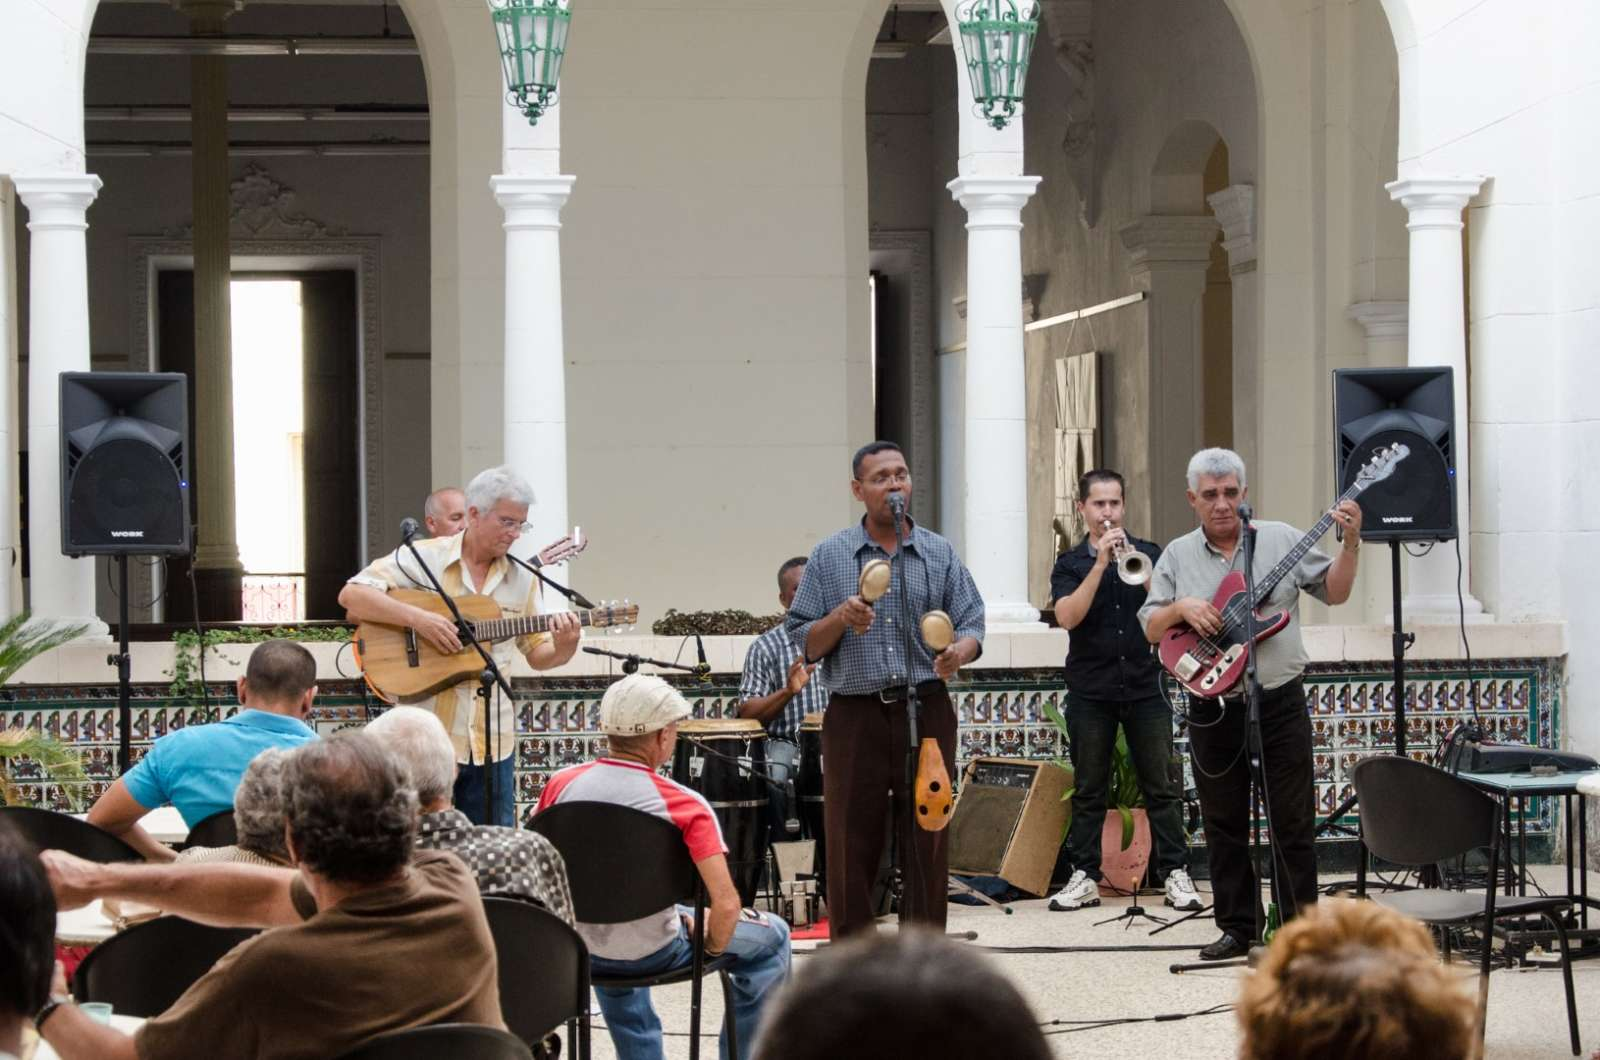 Live music in Santa Clara, Cuba